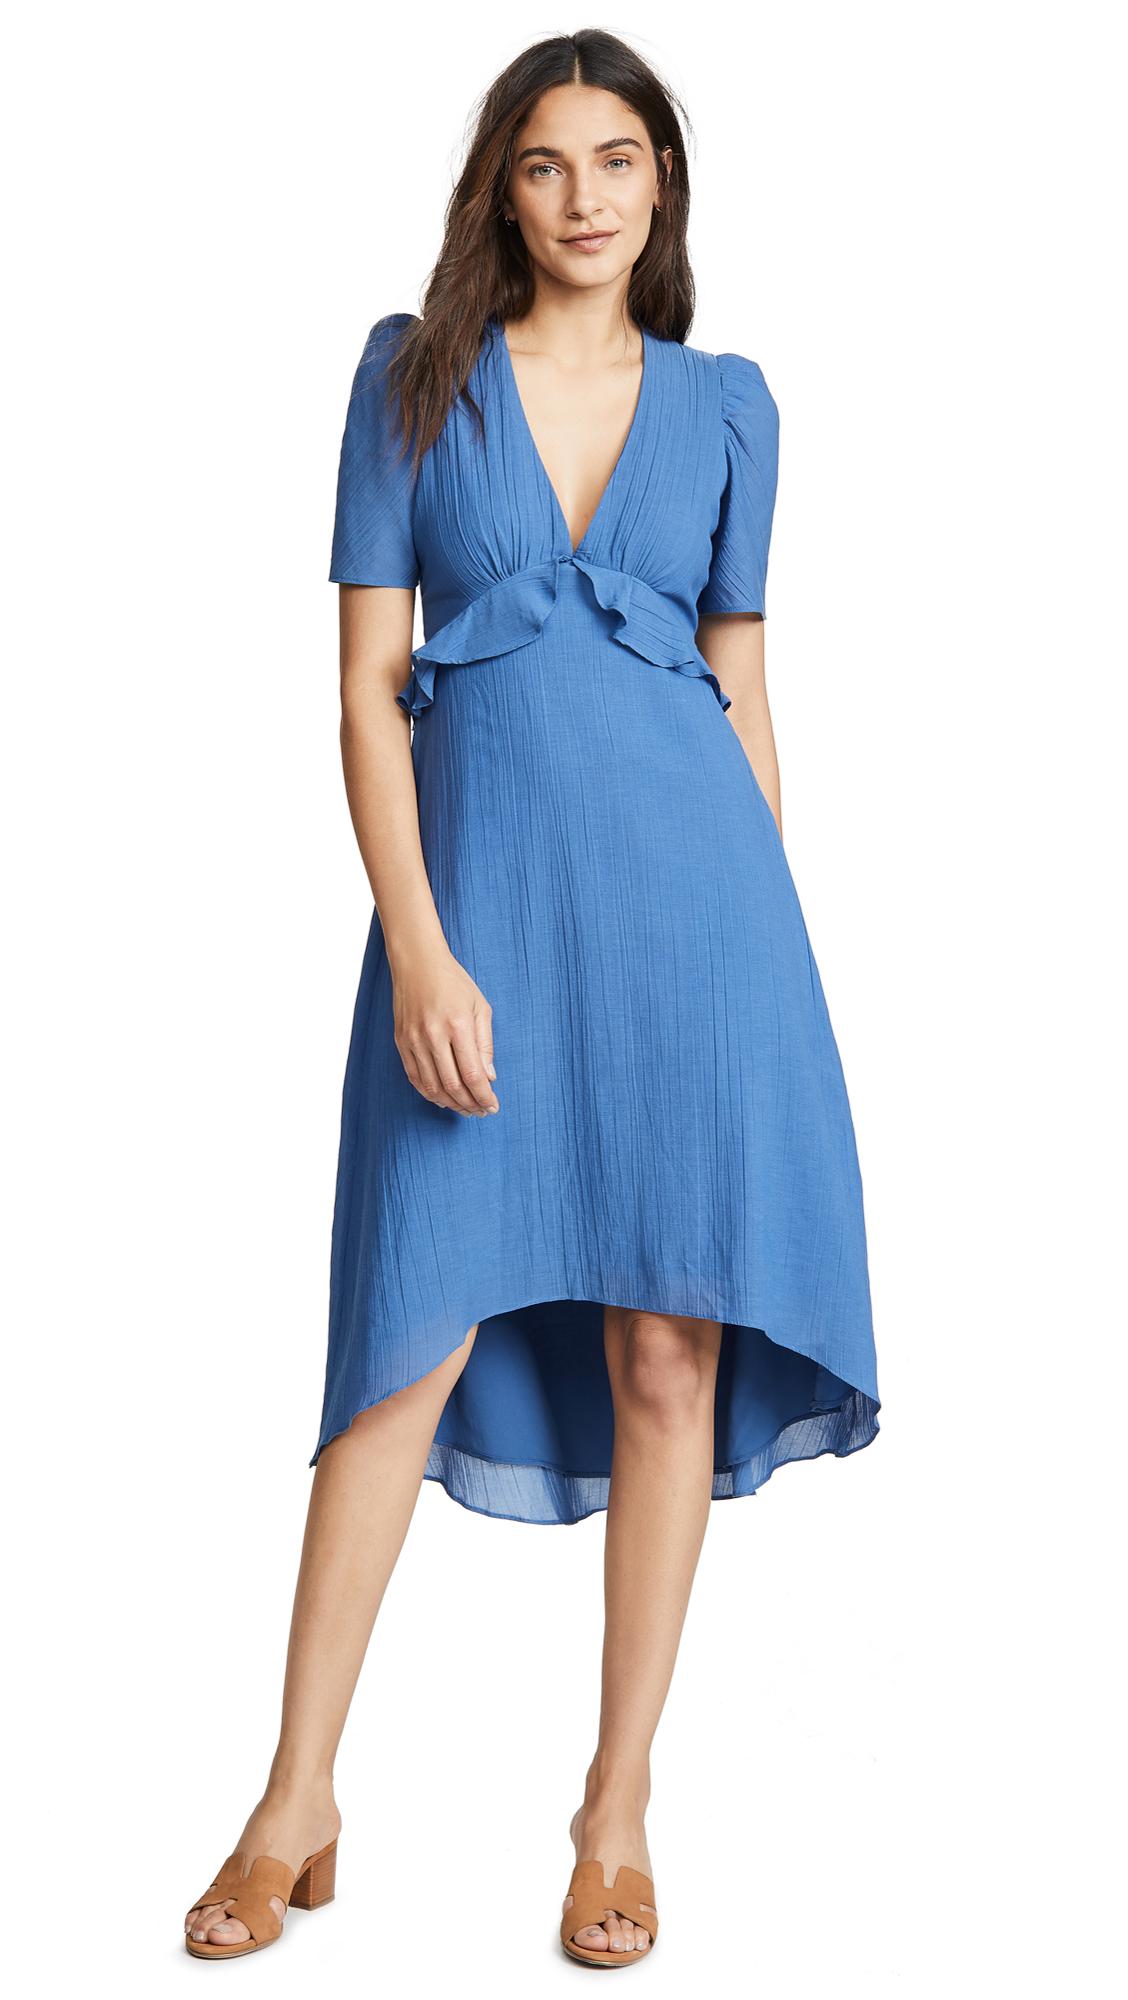 Saylor Deena Dress In Blue